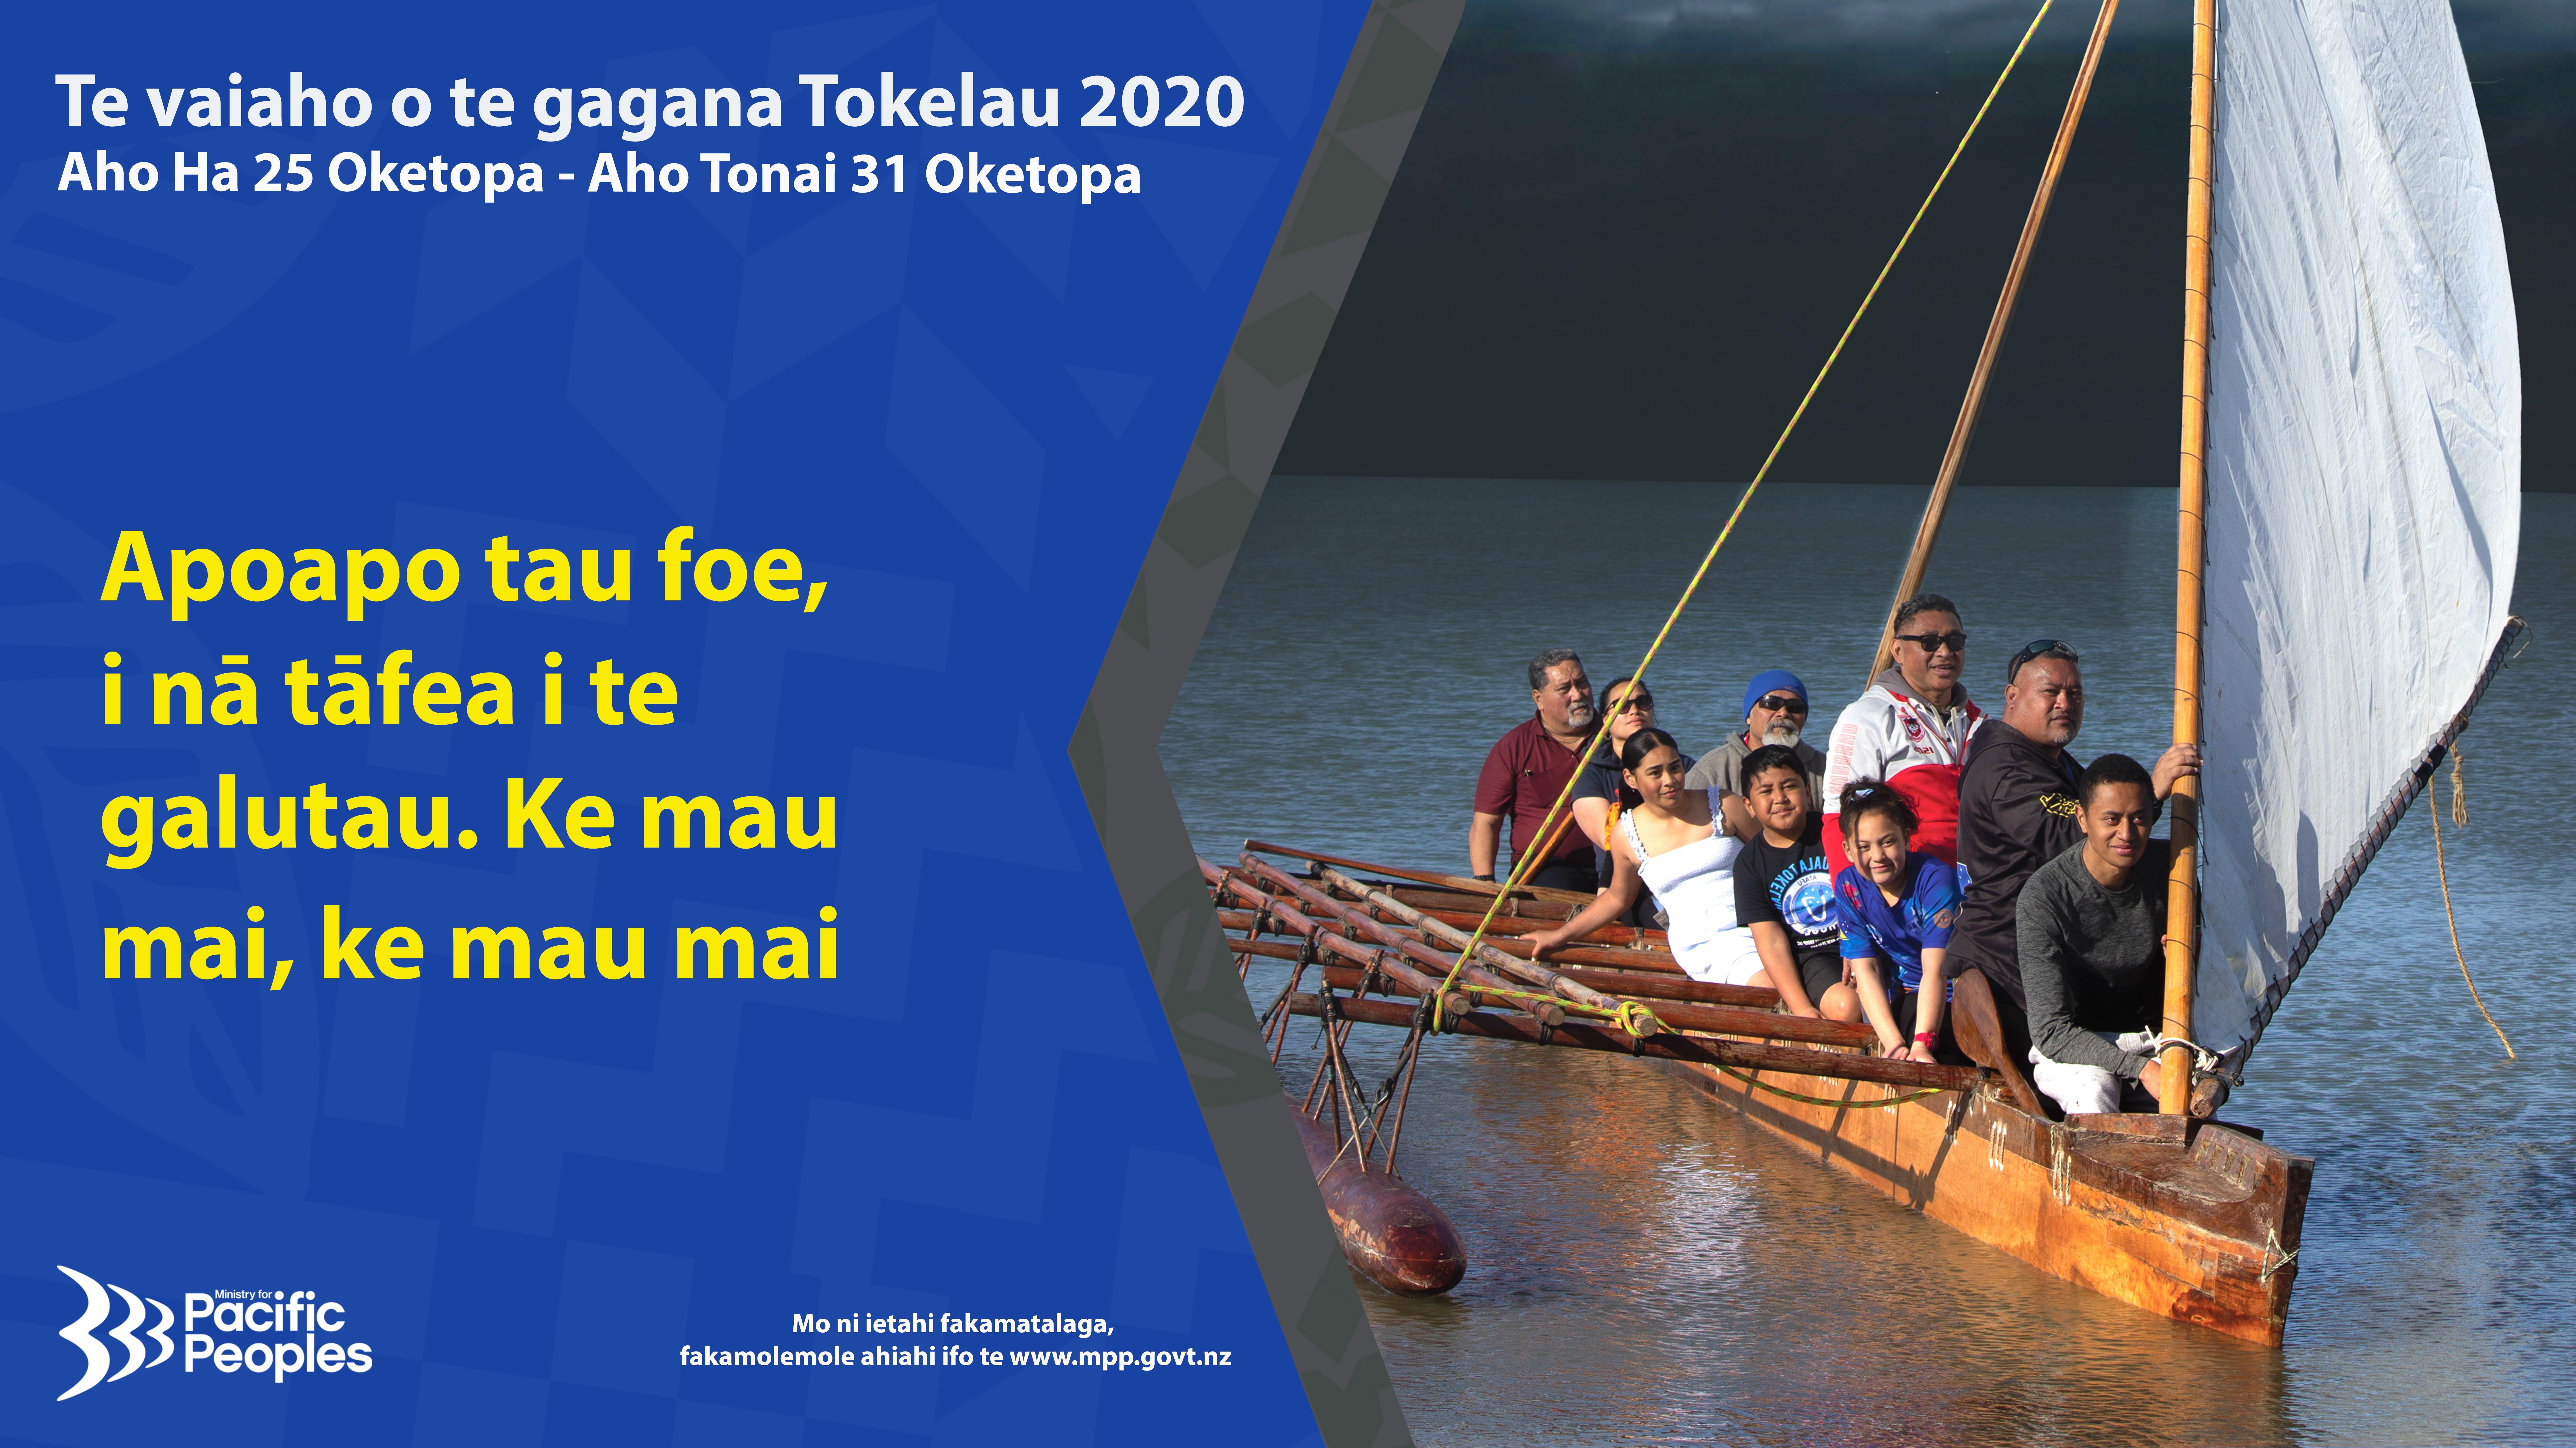 2020-Tokelau-LW-social-media-banner-Te-g